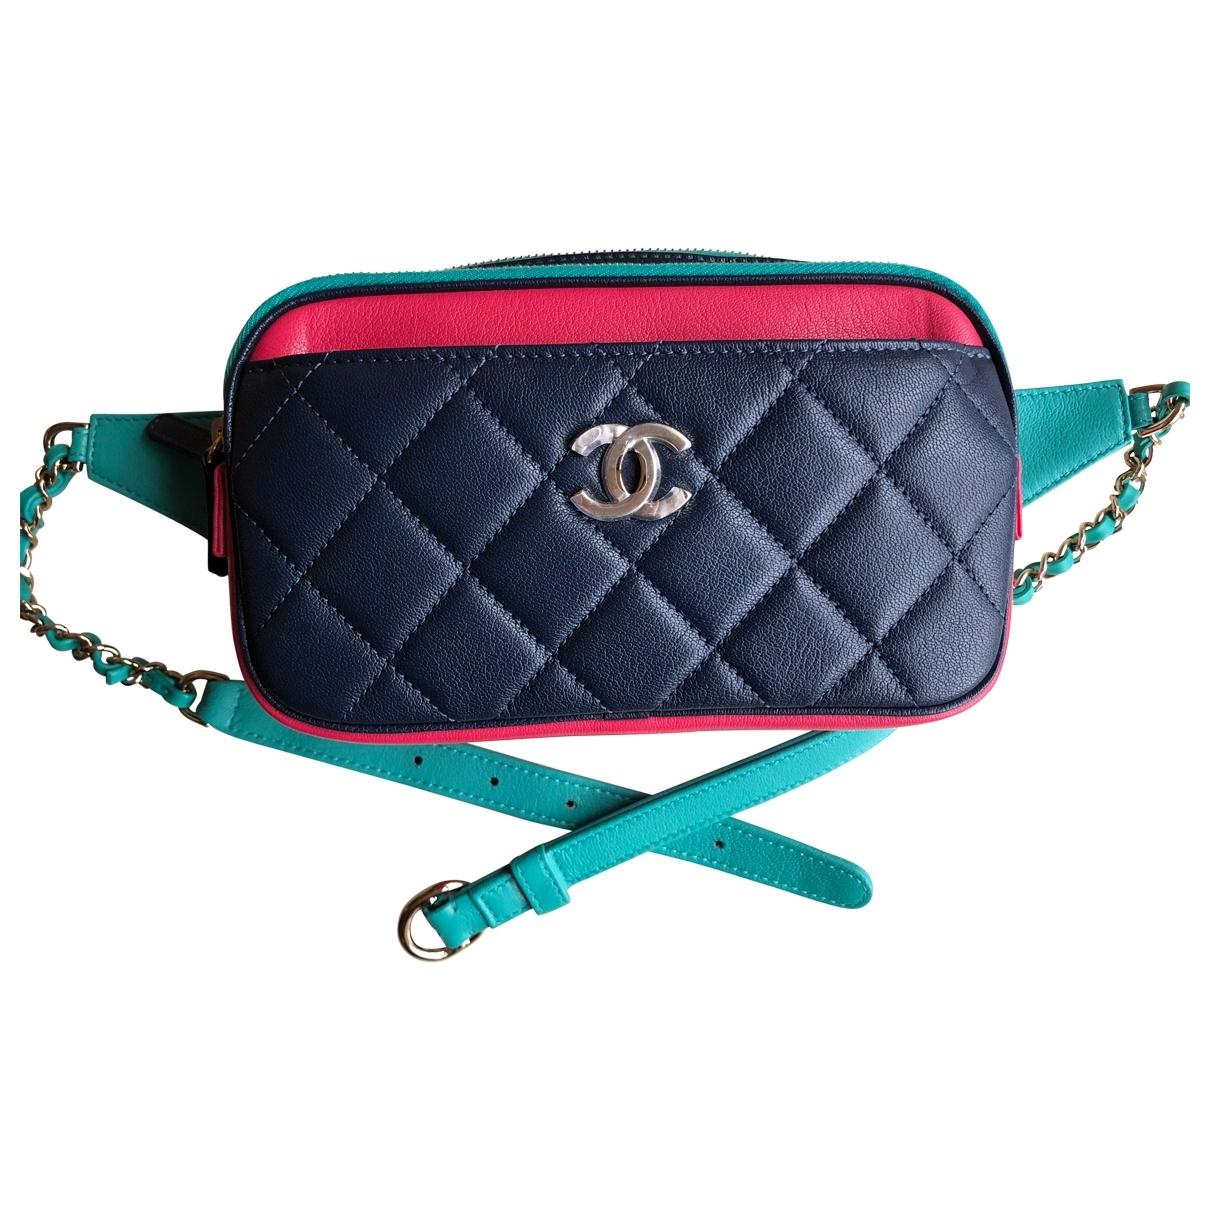 Chanel Timeless/Classique Clutch in  Bunt Leder